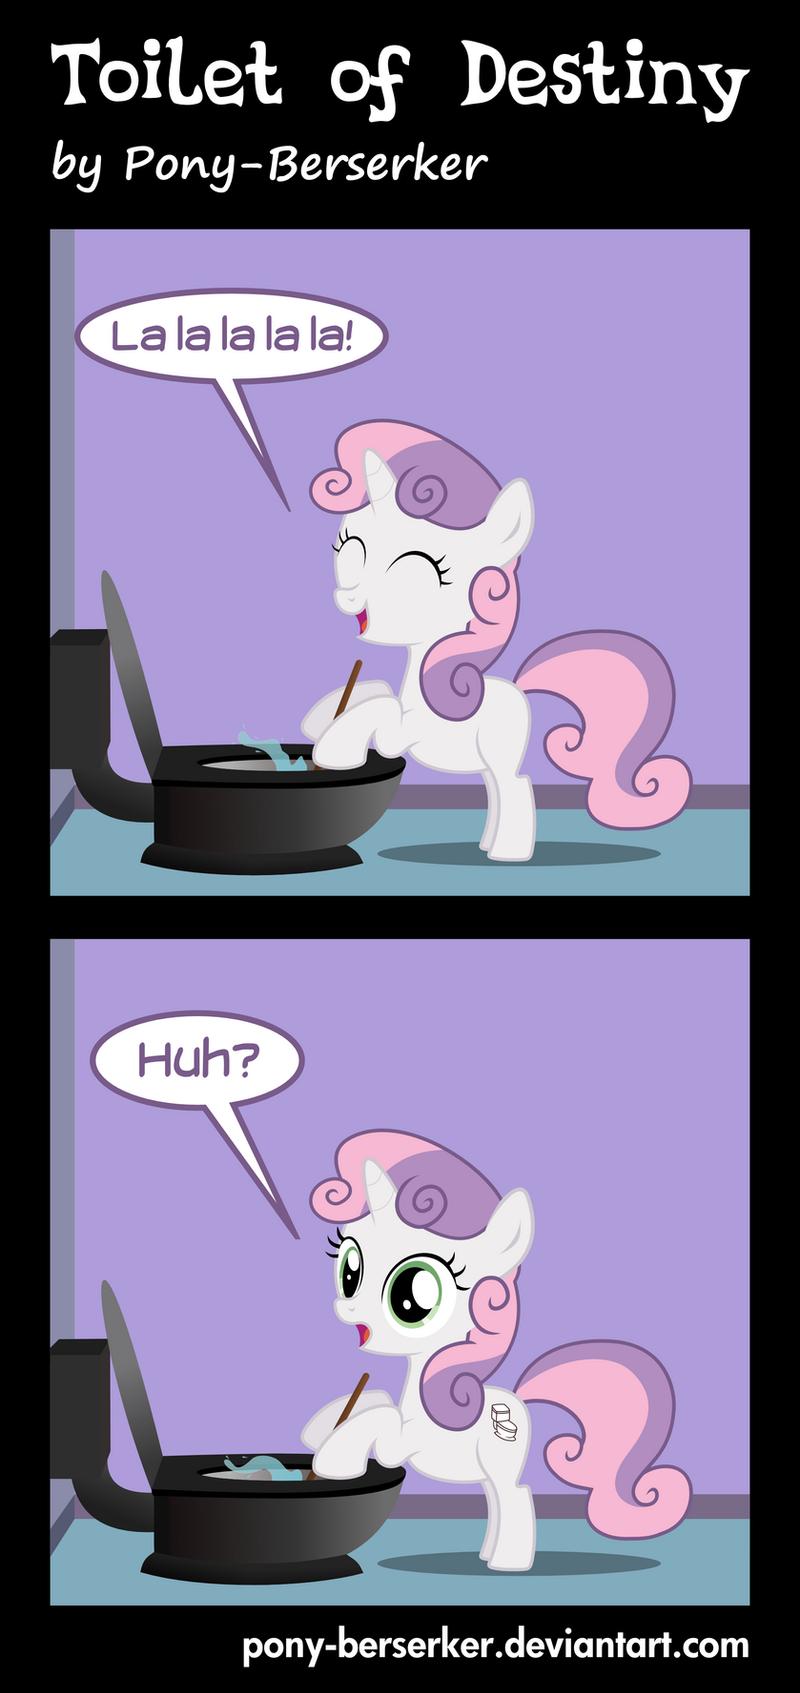 Toilet of Destiny by Pony-Berserker